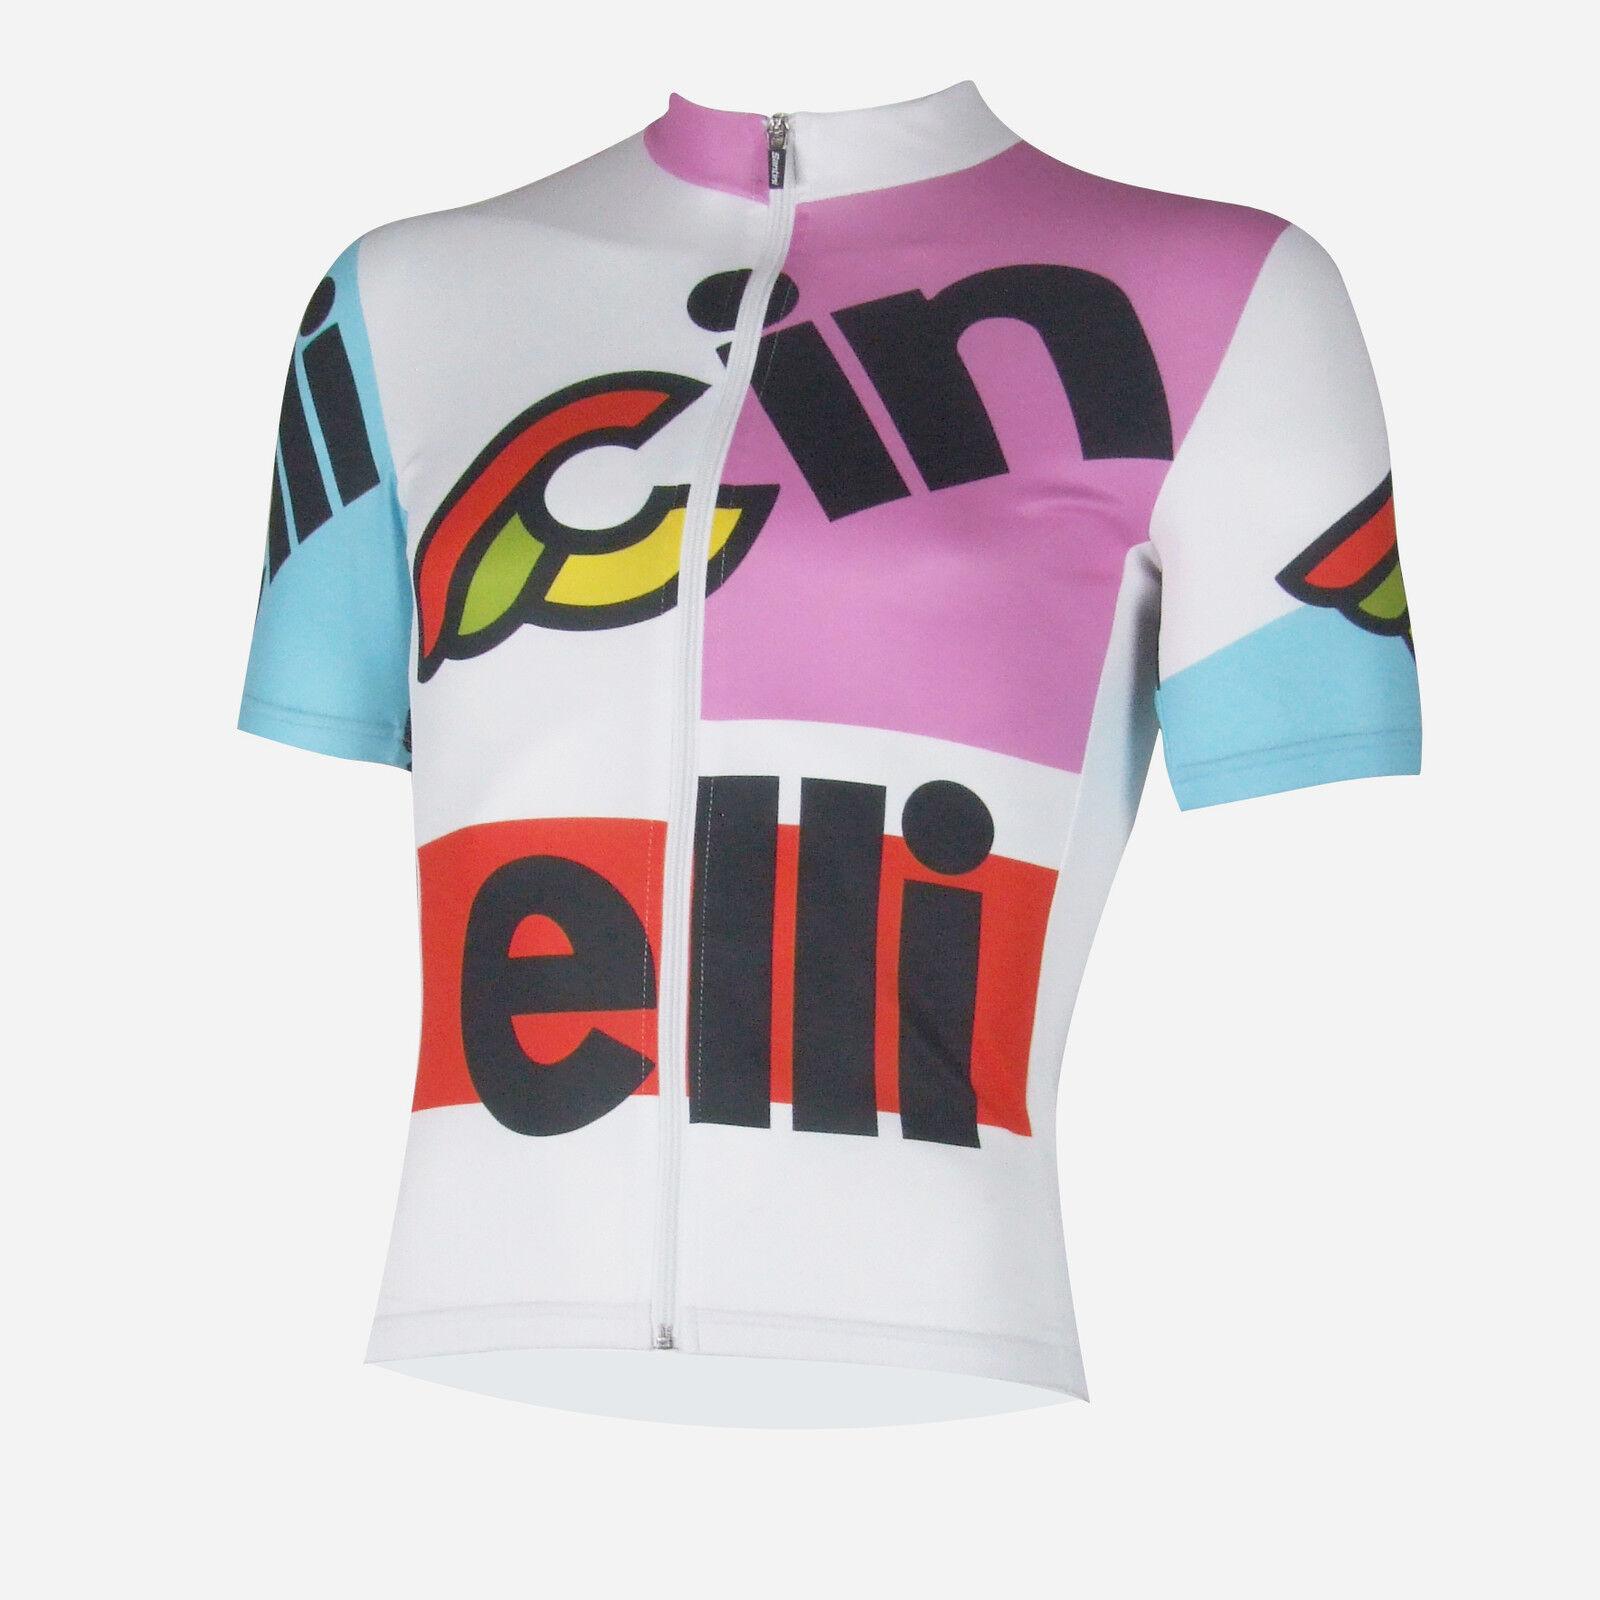 Cinelli Cycling Jersey by Santini